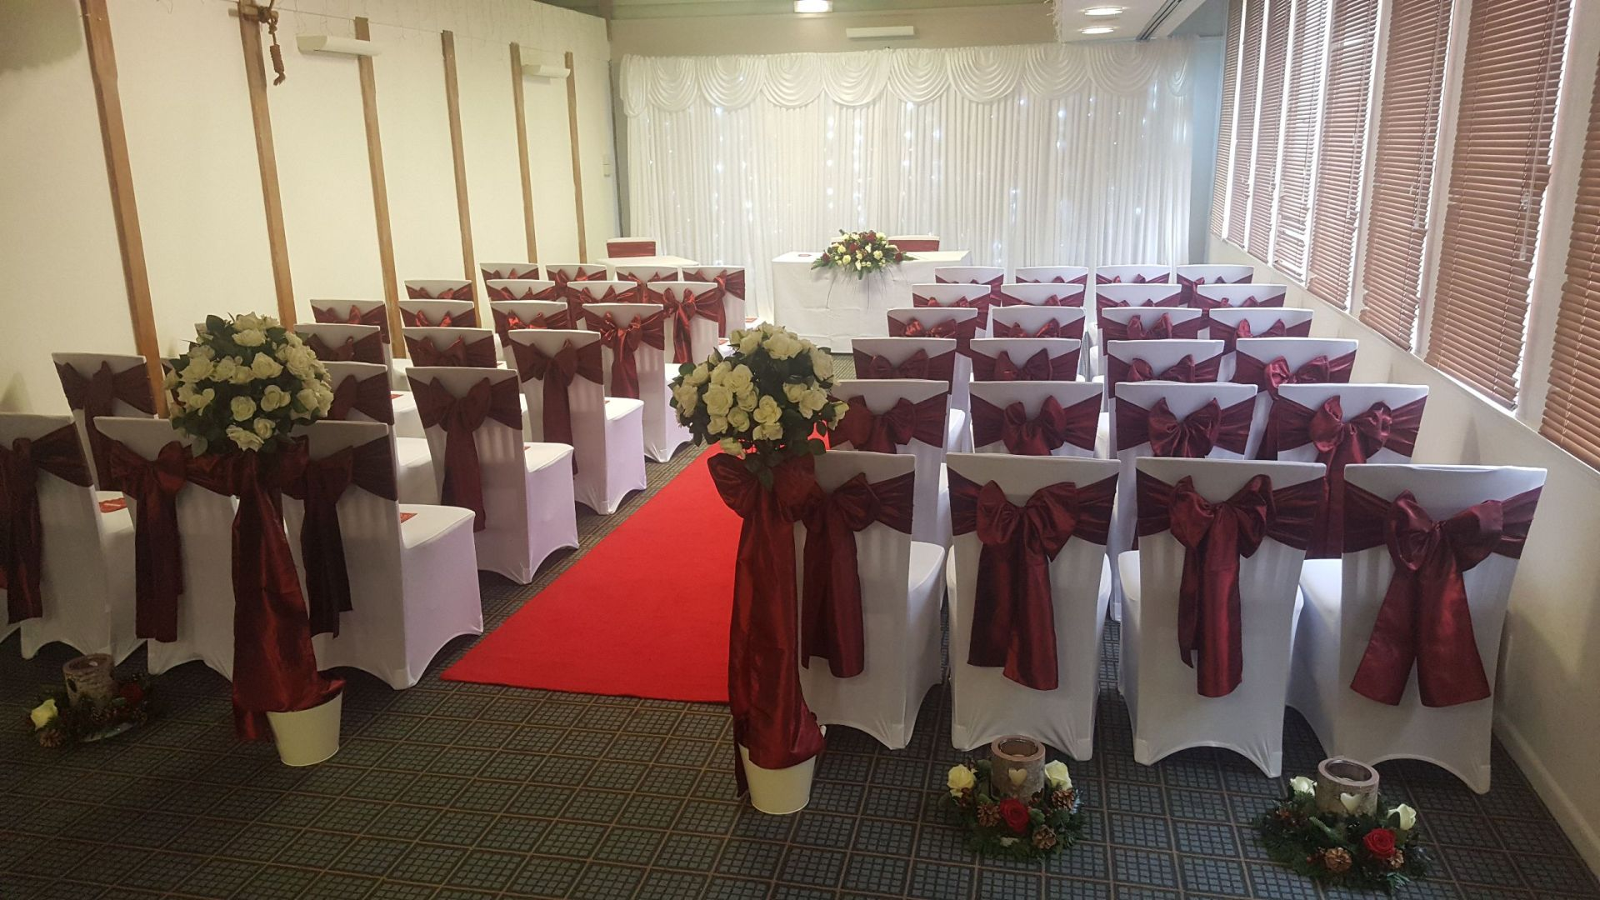 Holiday Inn Red themed Wedding